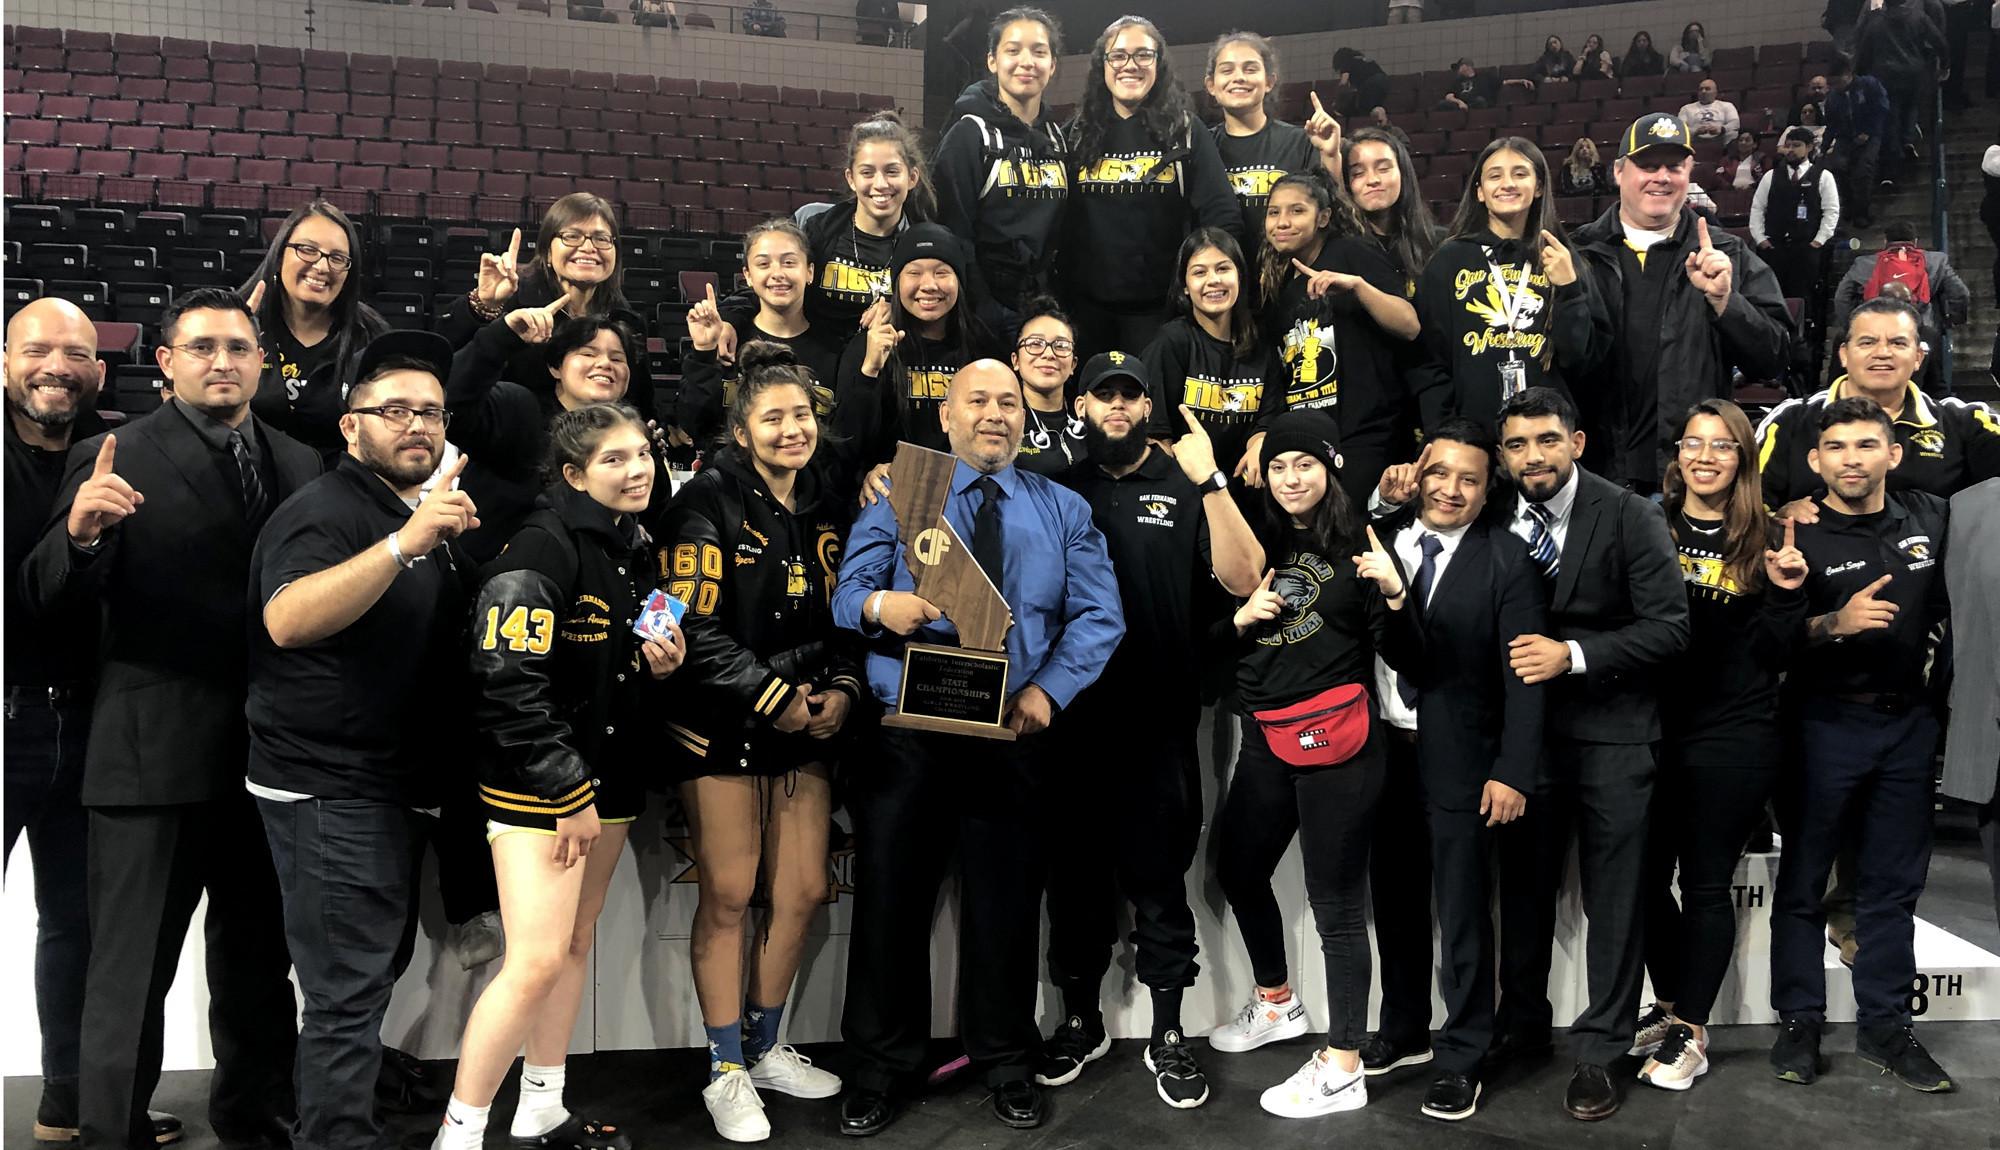 San Fernando wins girls' state championship in wrestling